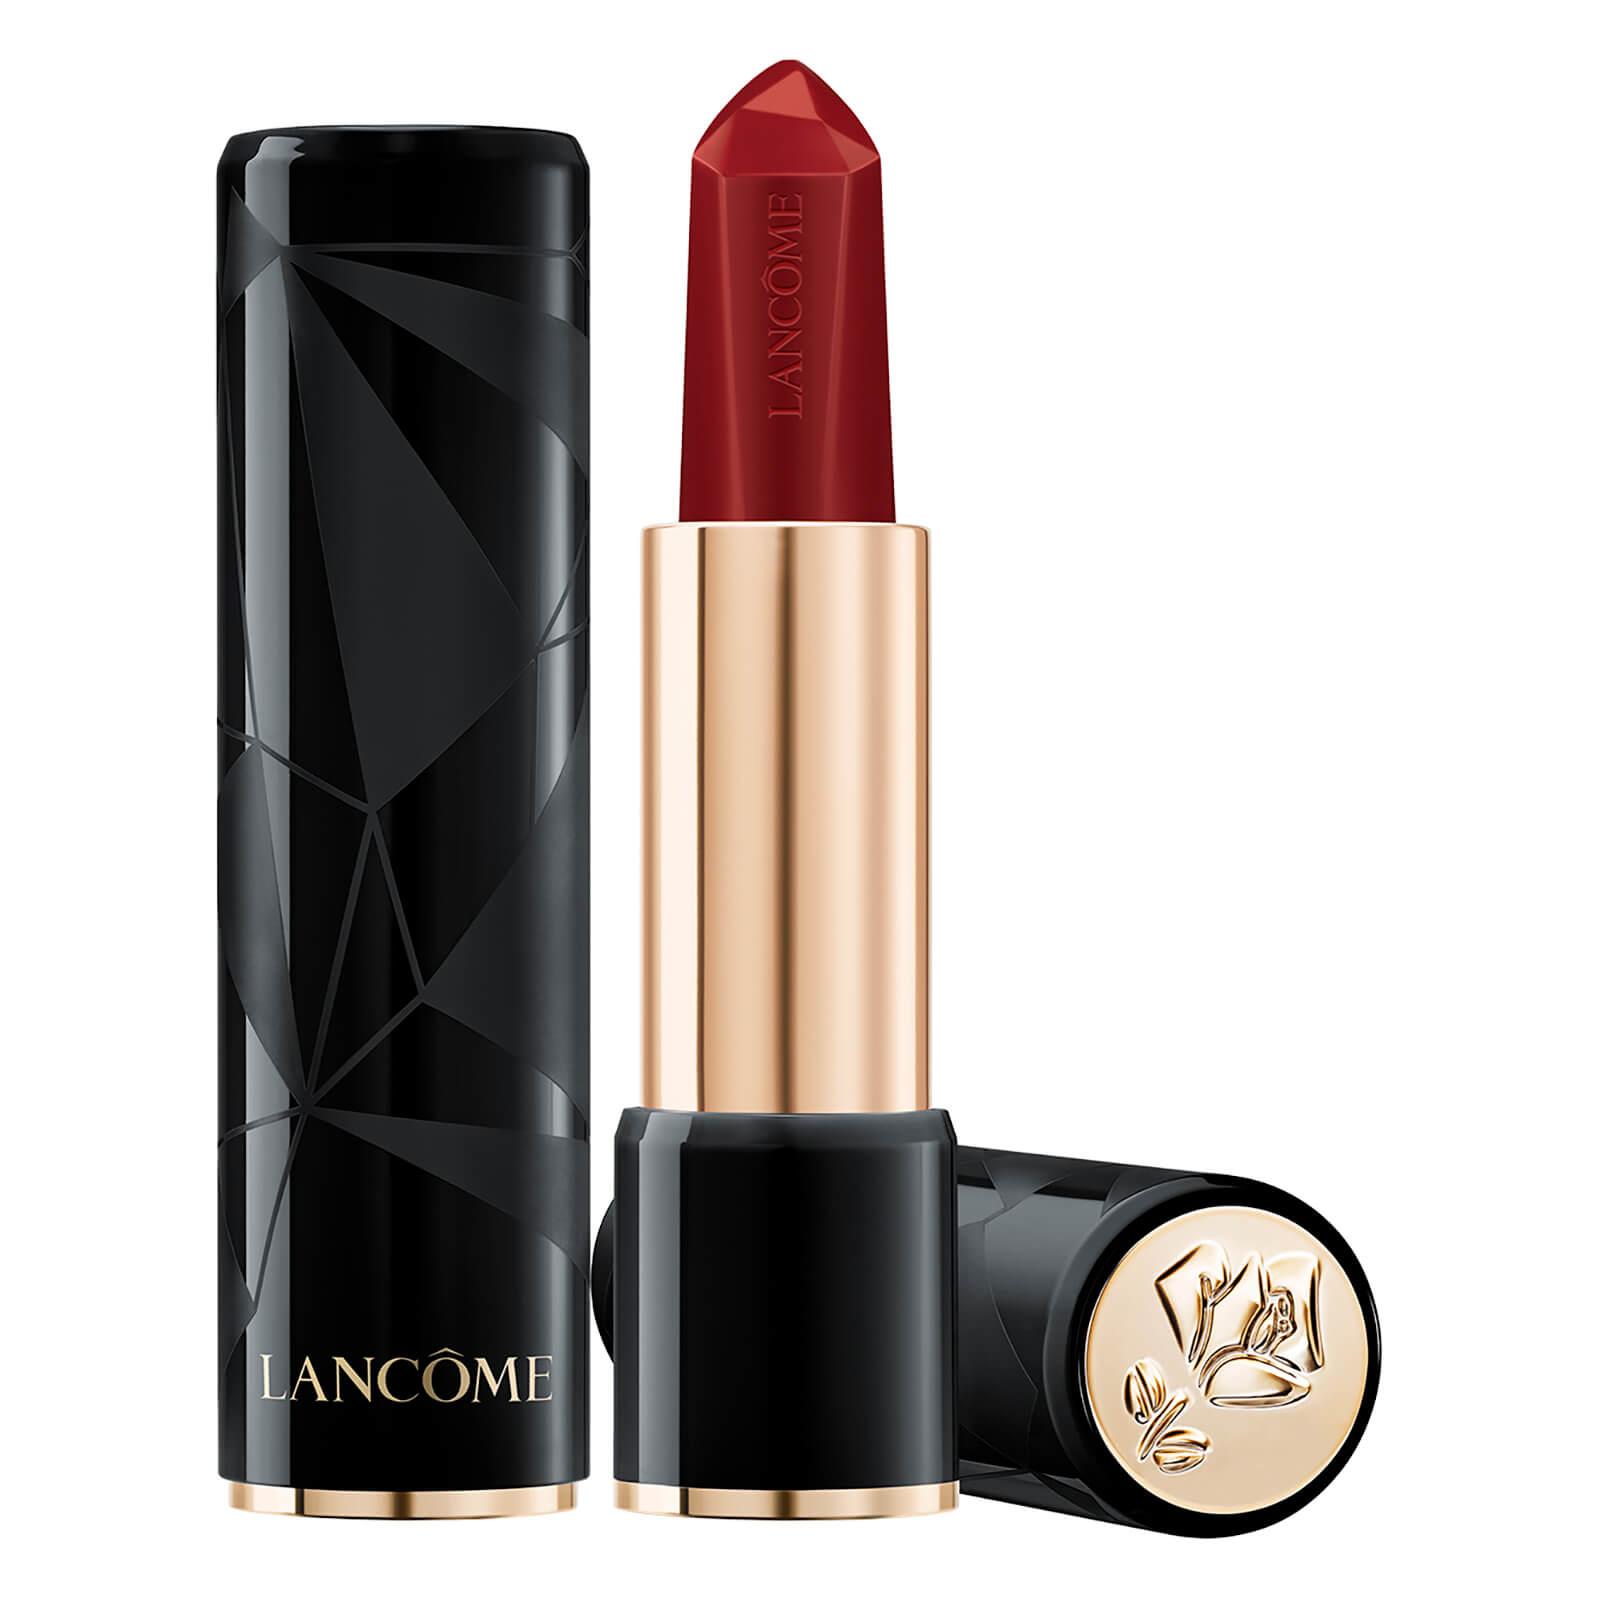 Lancome Absolu Rouge Ruby Cream